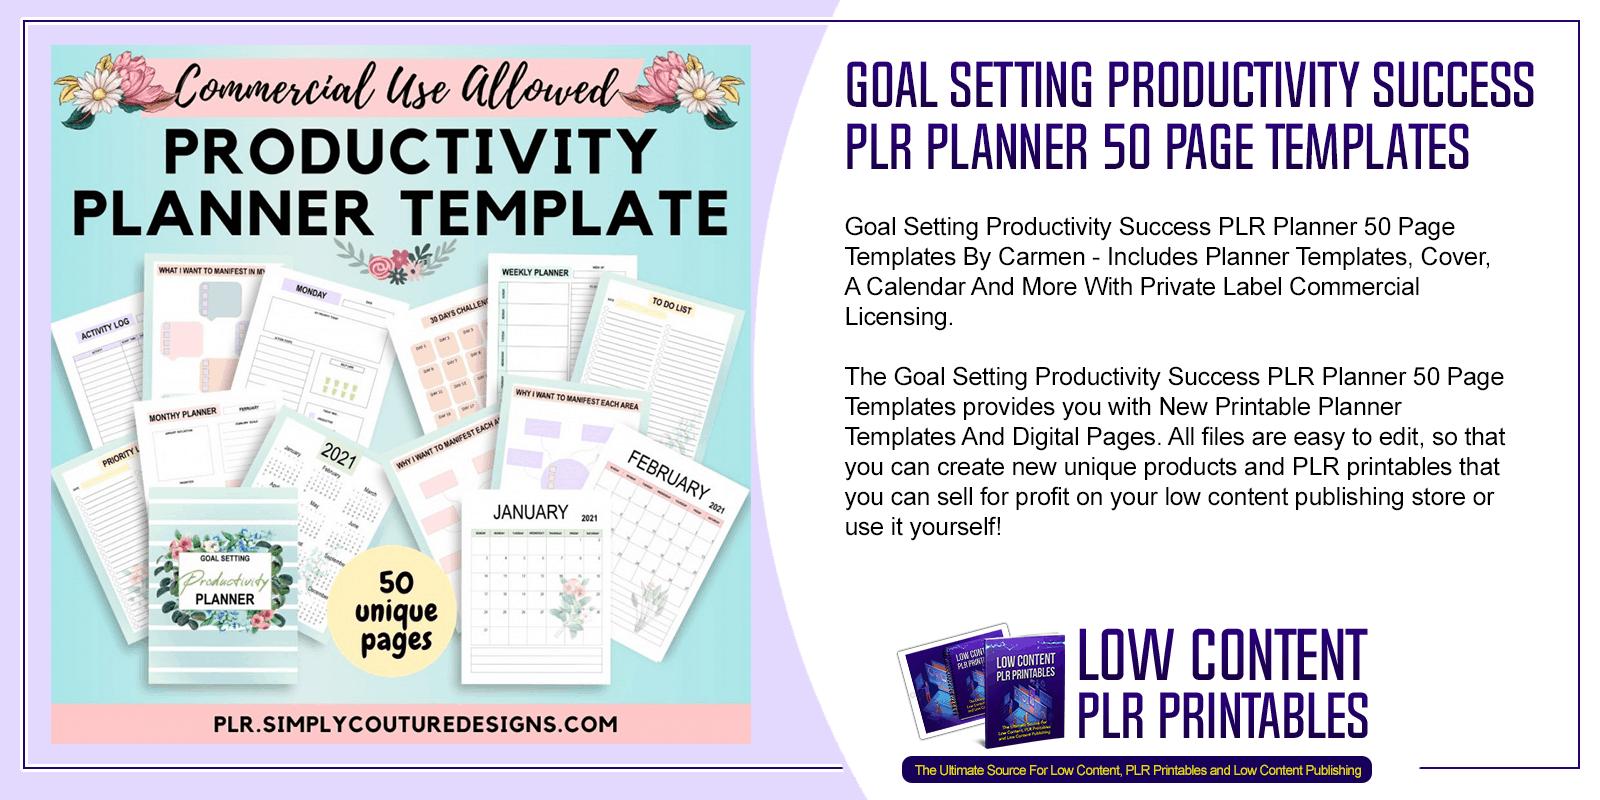 Goal Setting Productivity Success PLR Planner 50 Page Templates